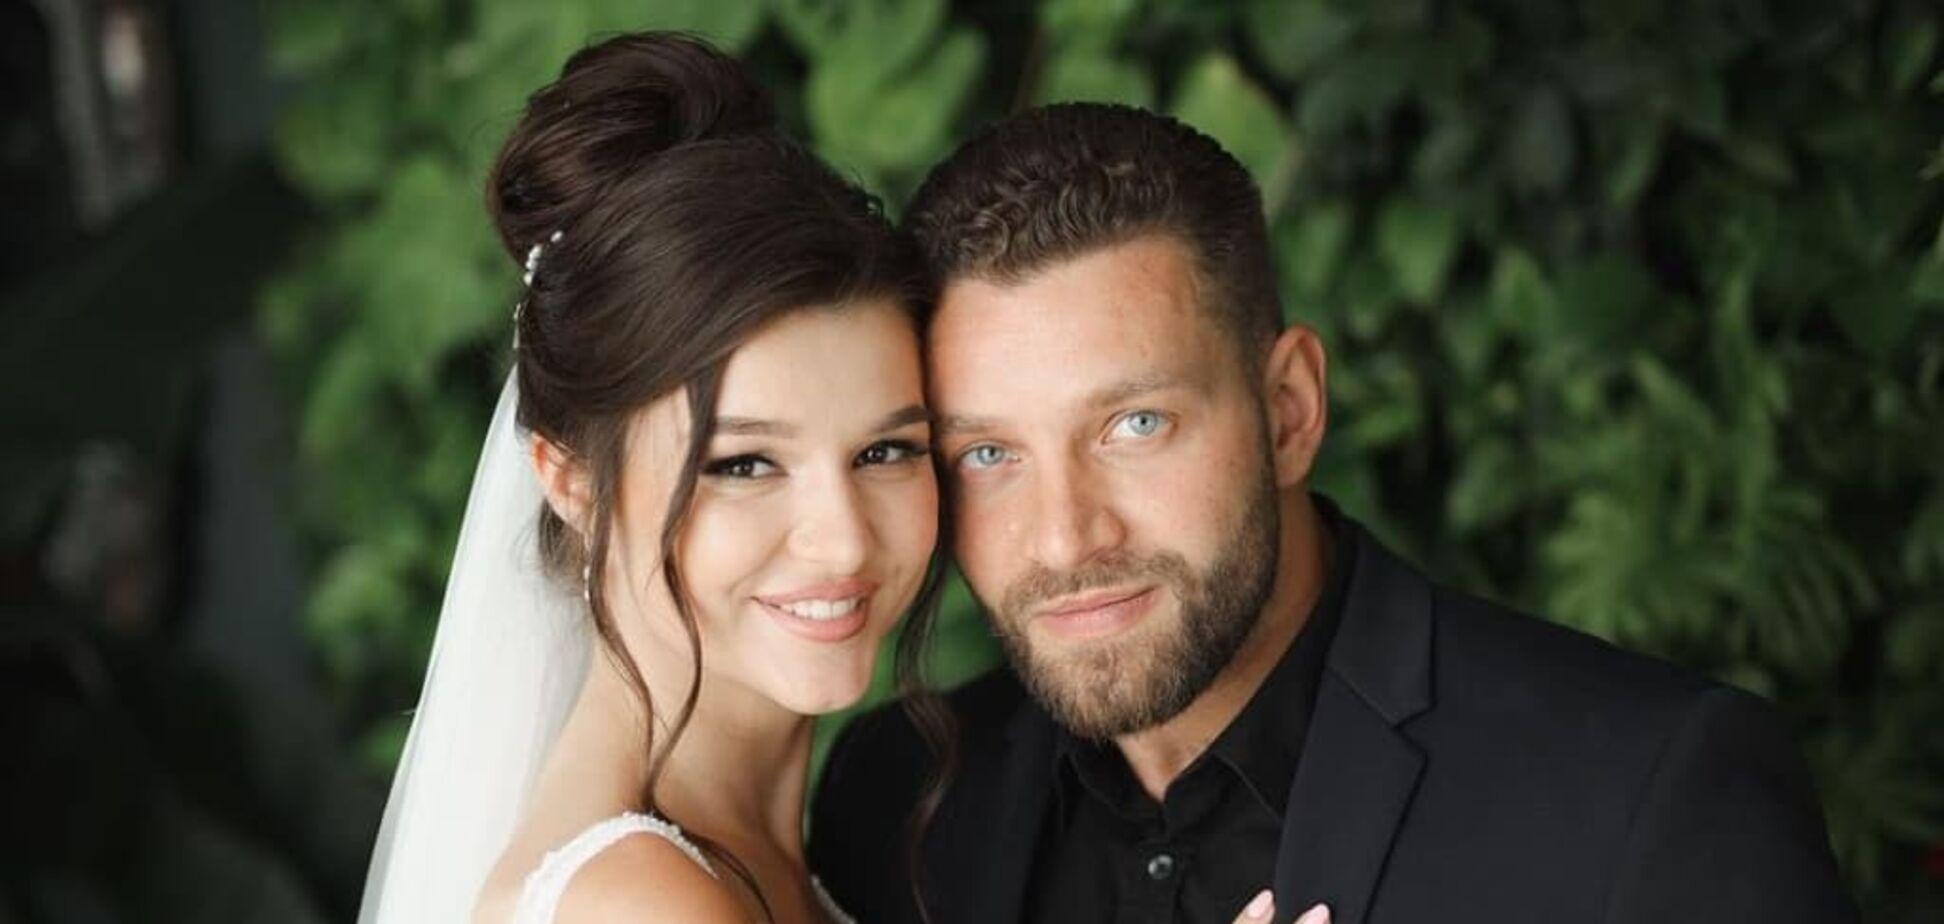 Юлія Бельченко та Богдан Юсипчук